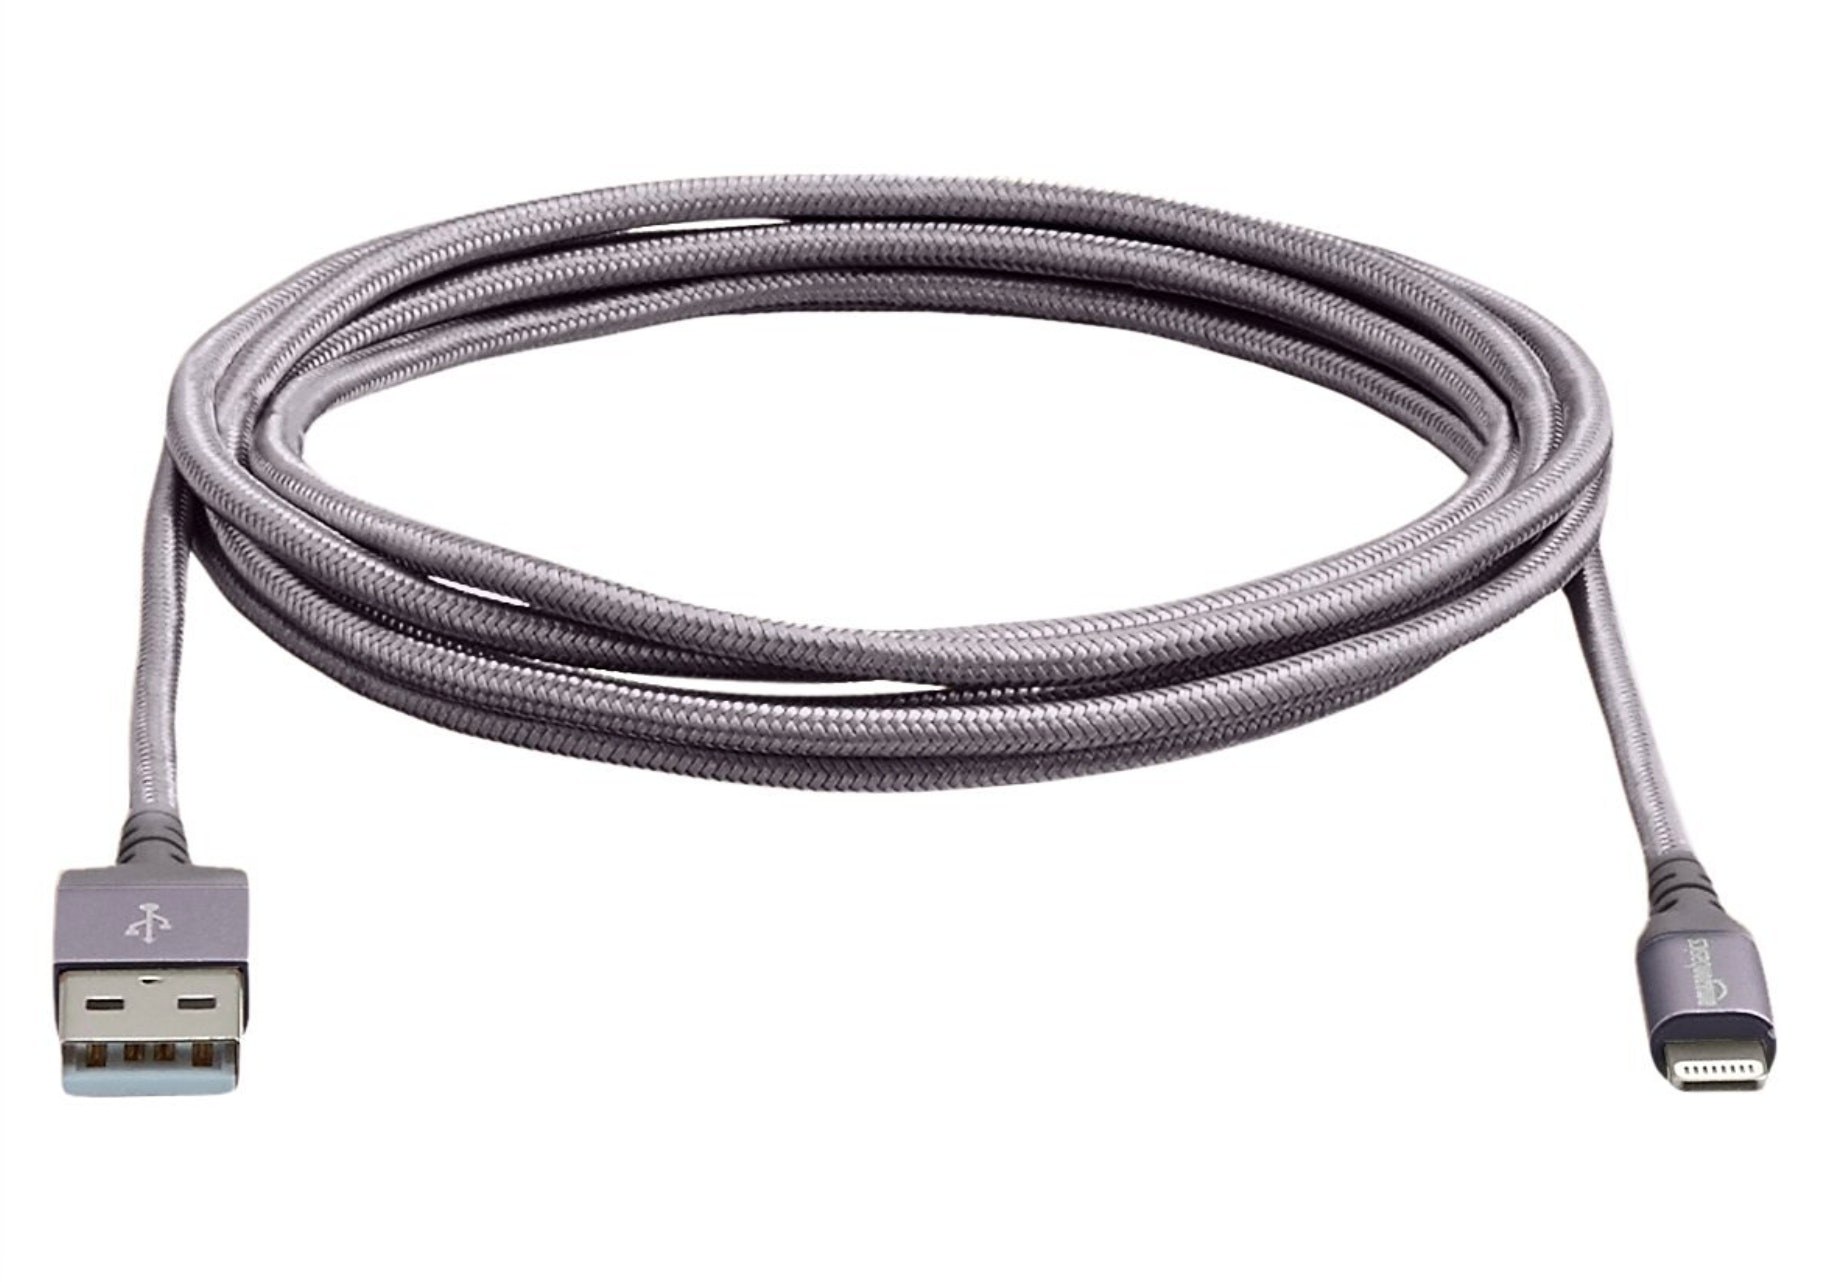 amazonbasics cable